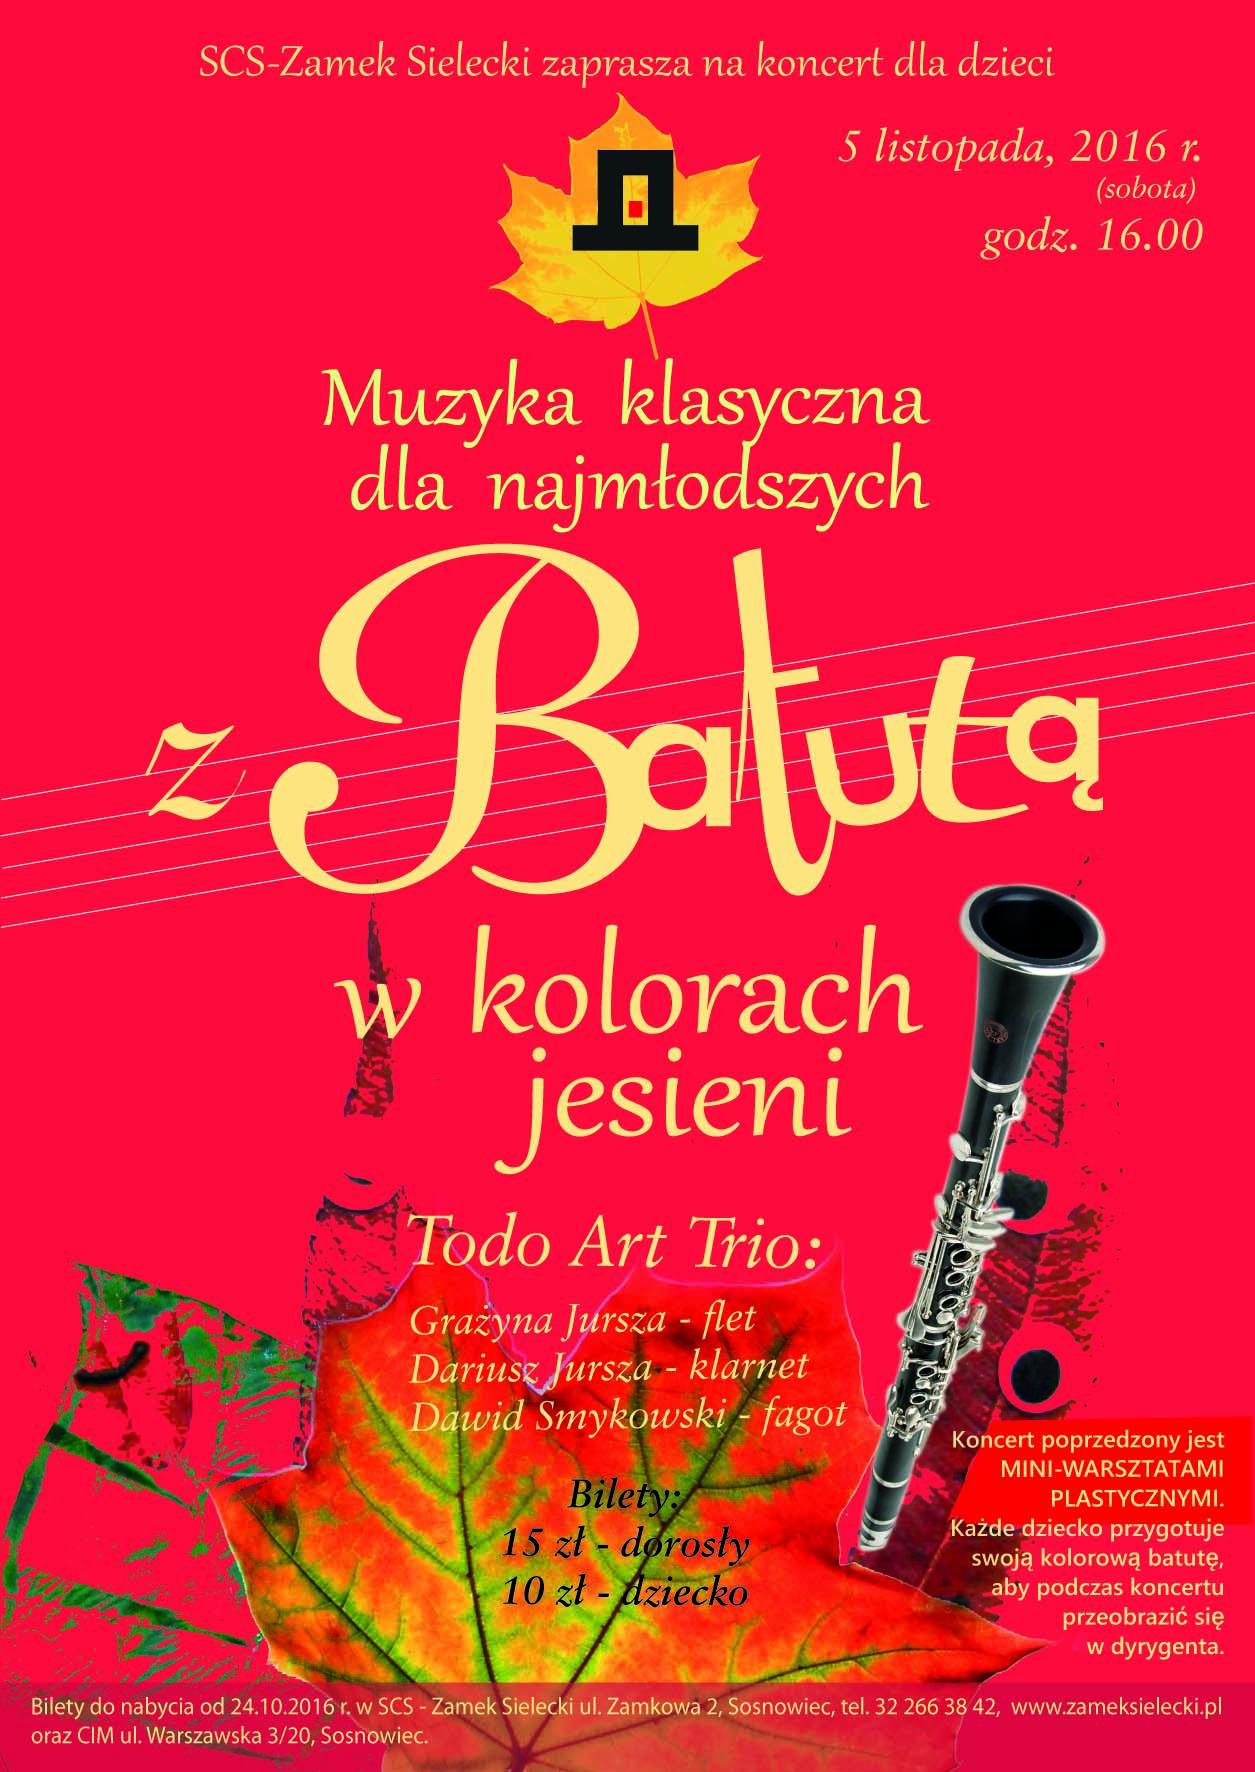 koncert dla dzieci Sosnowiec plakat